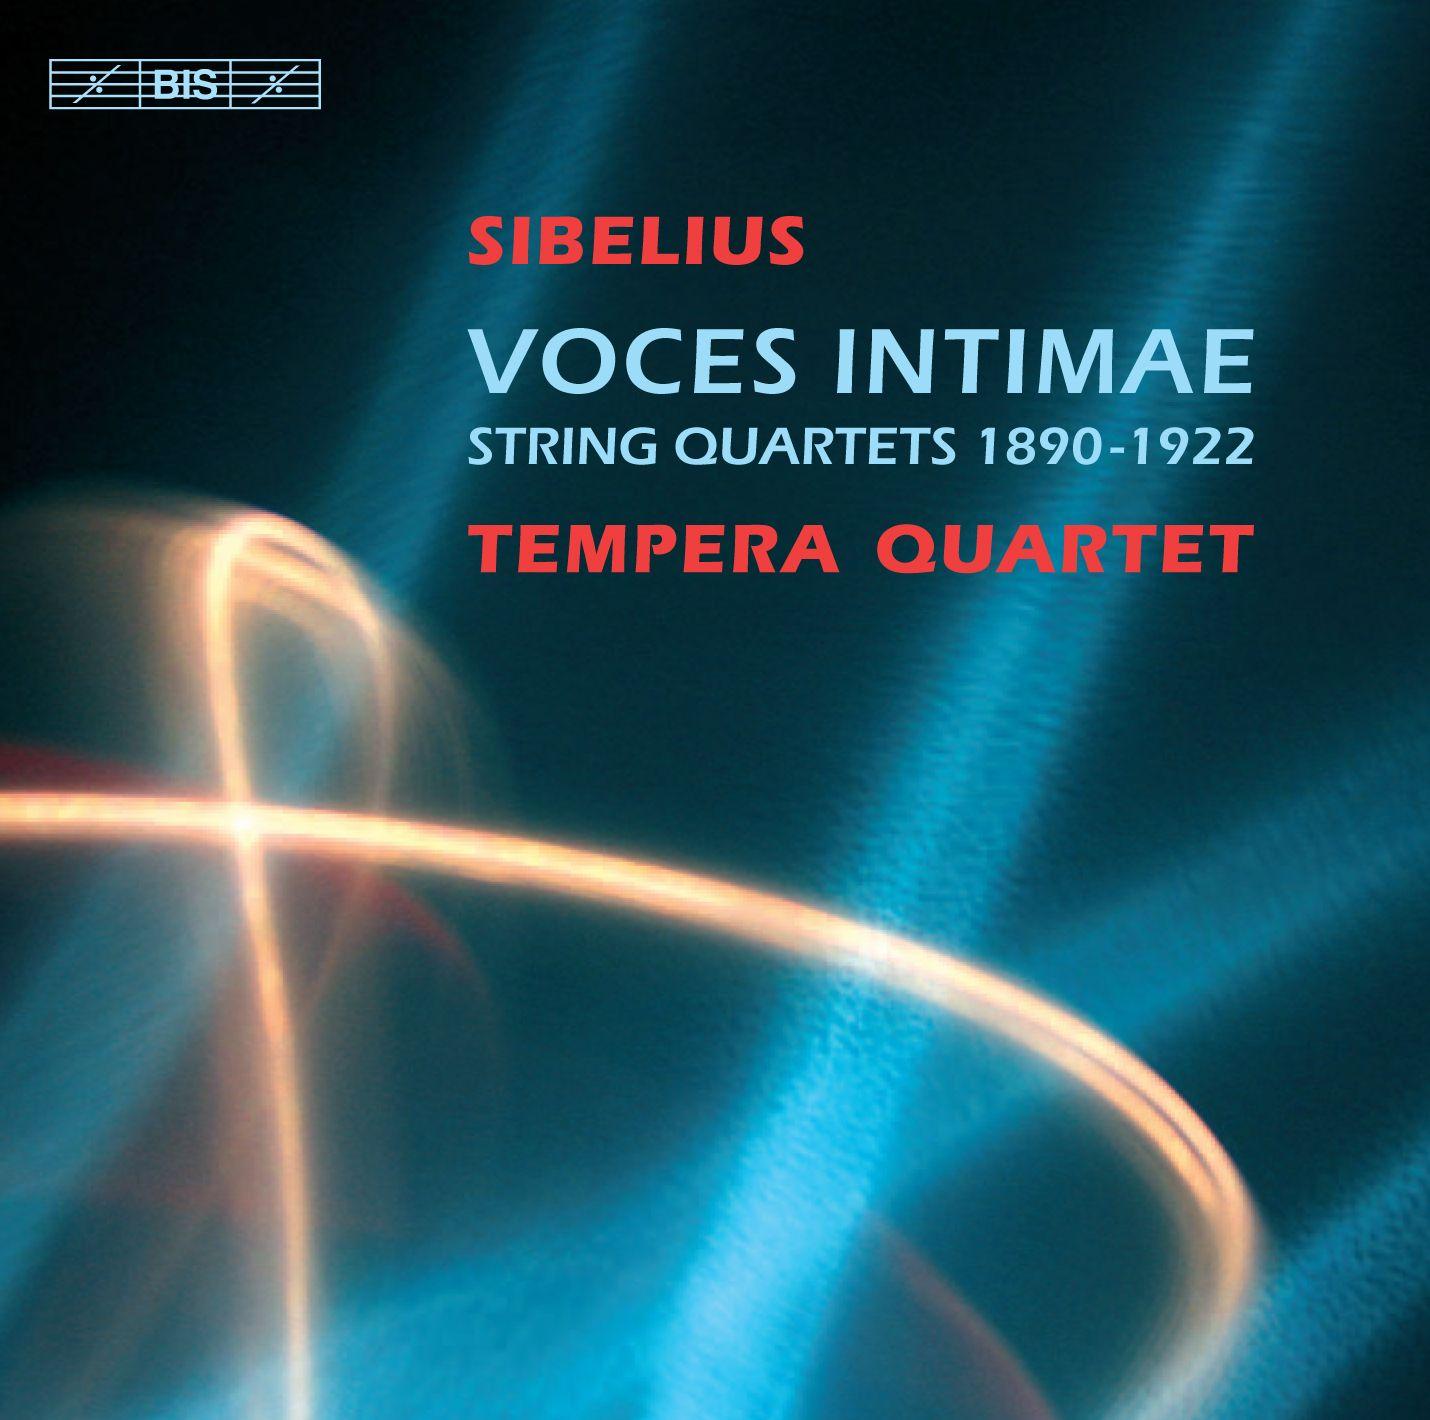 Tempera Quartet // BIS BIS-CD-1466 - Recorded 2004